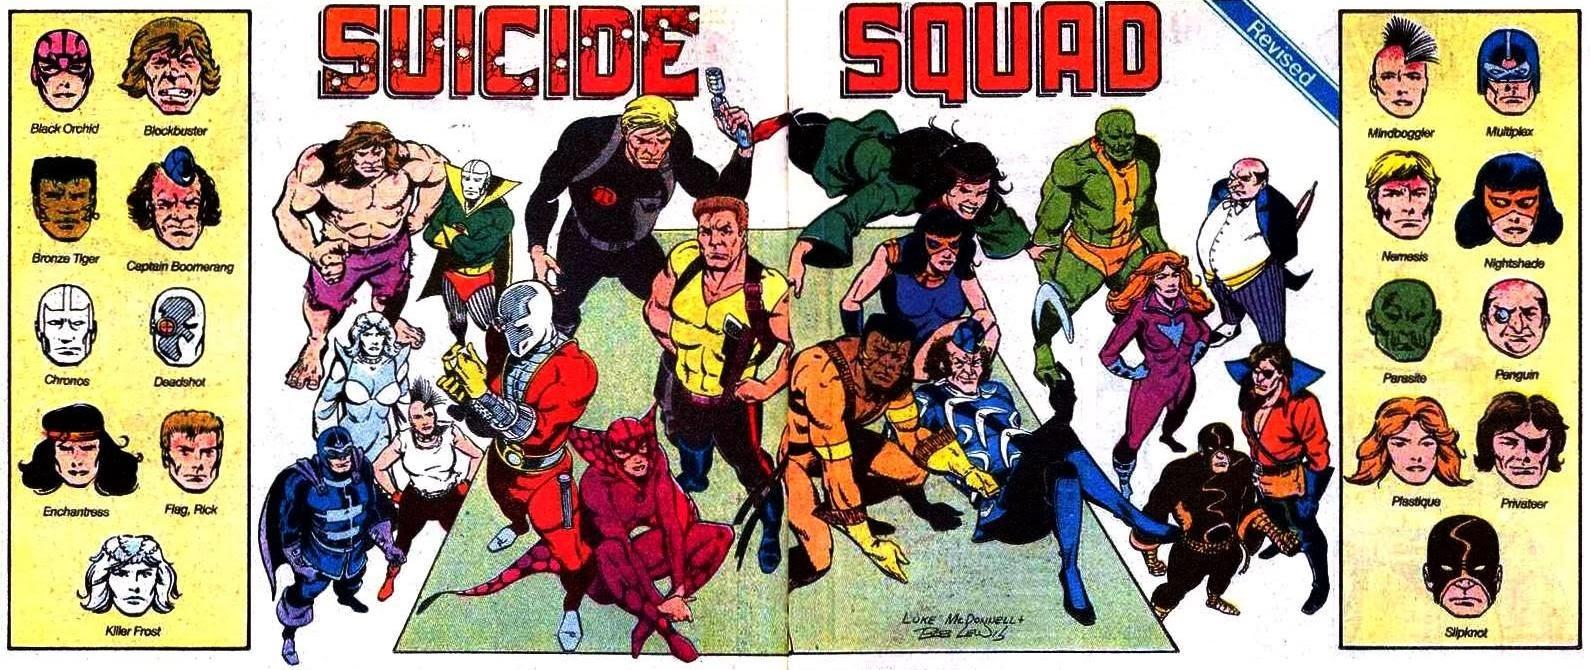 [CINEMA] Suicide Squad - TRAILER! Suicide_Squad_0027